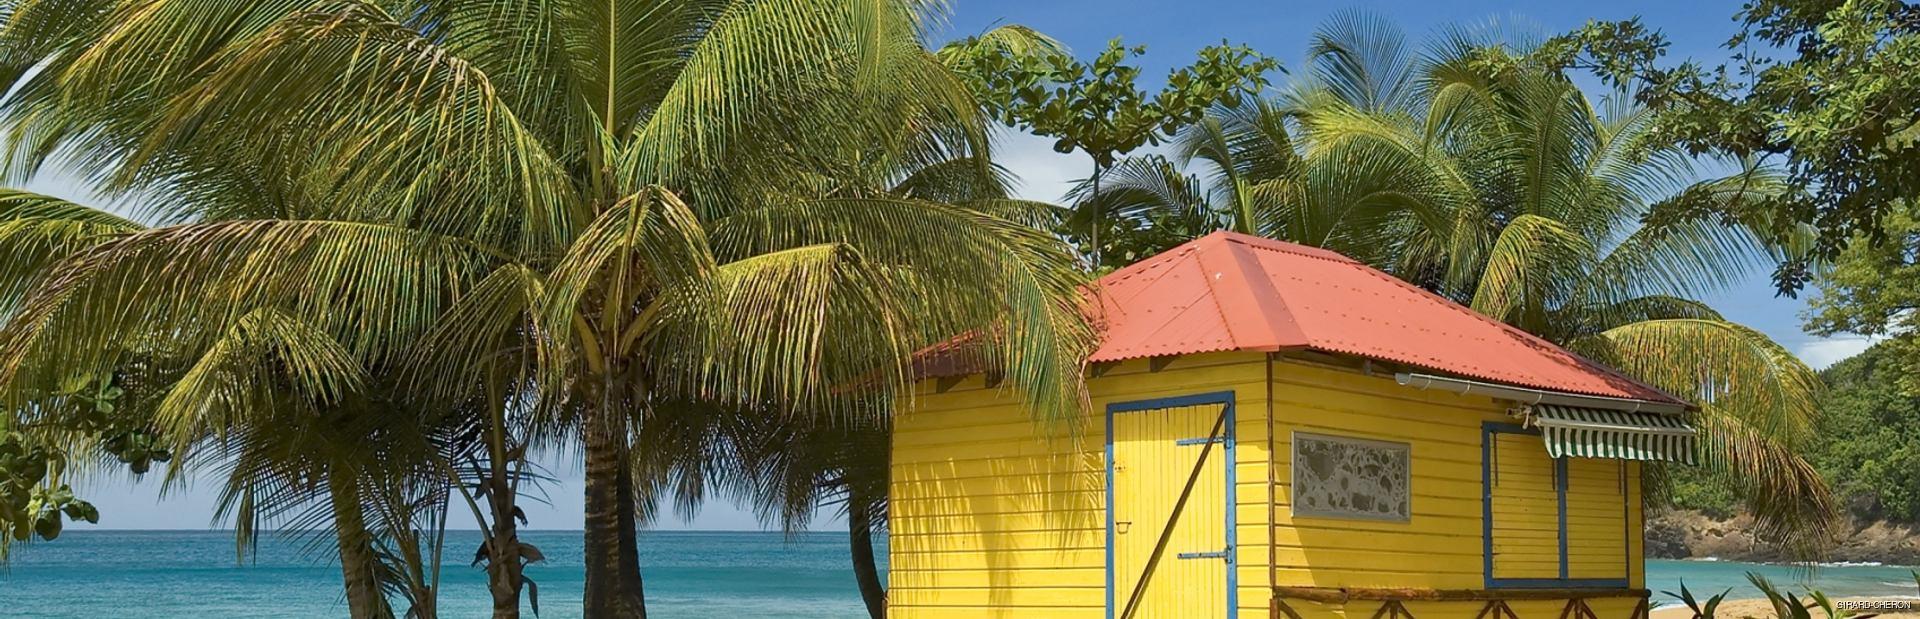 Guadeloupe guide